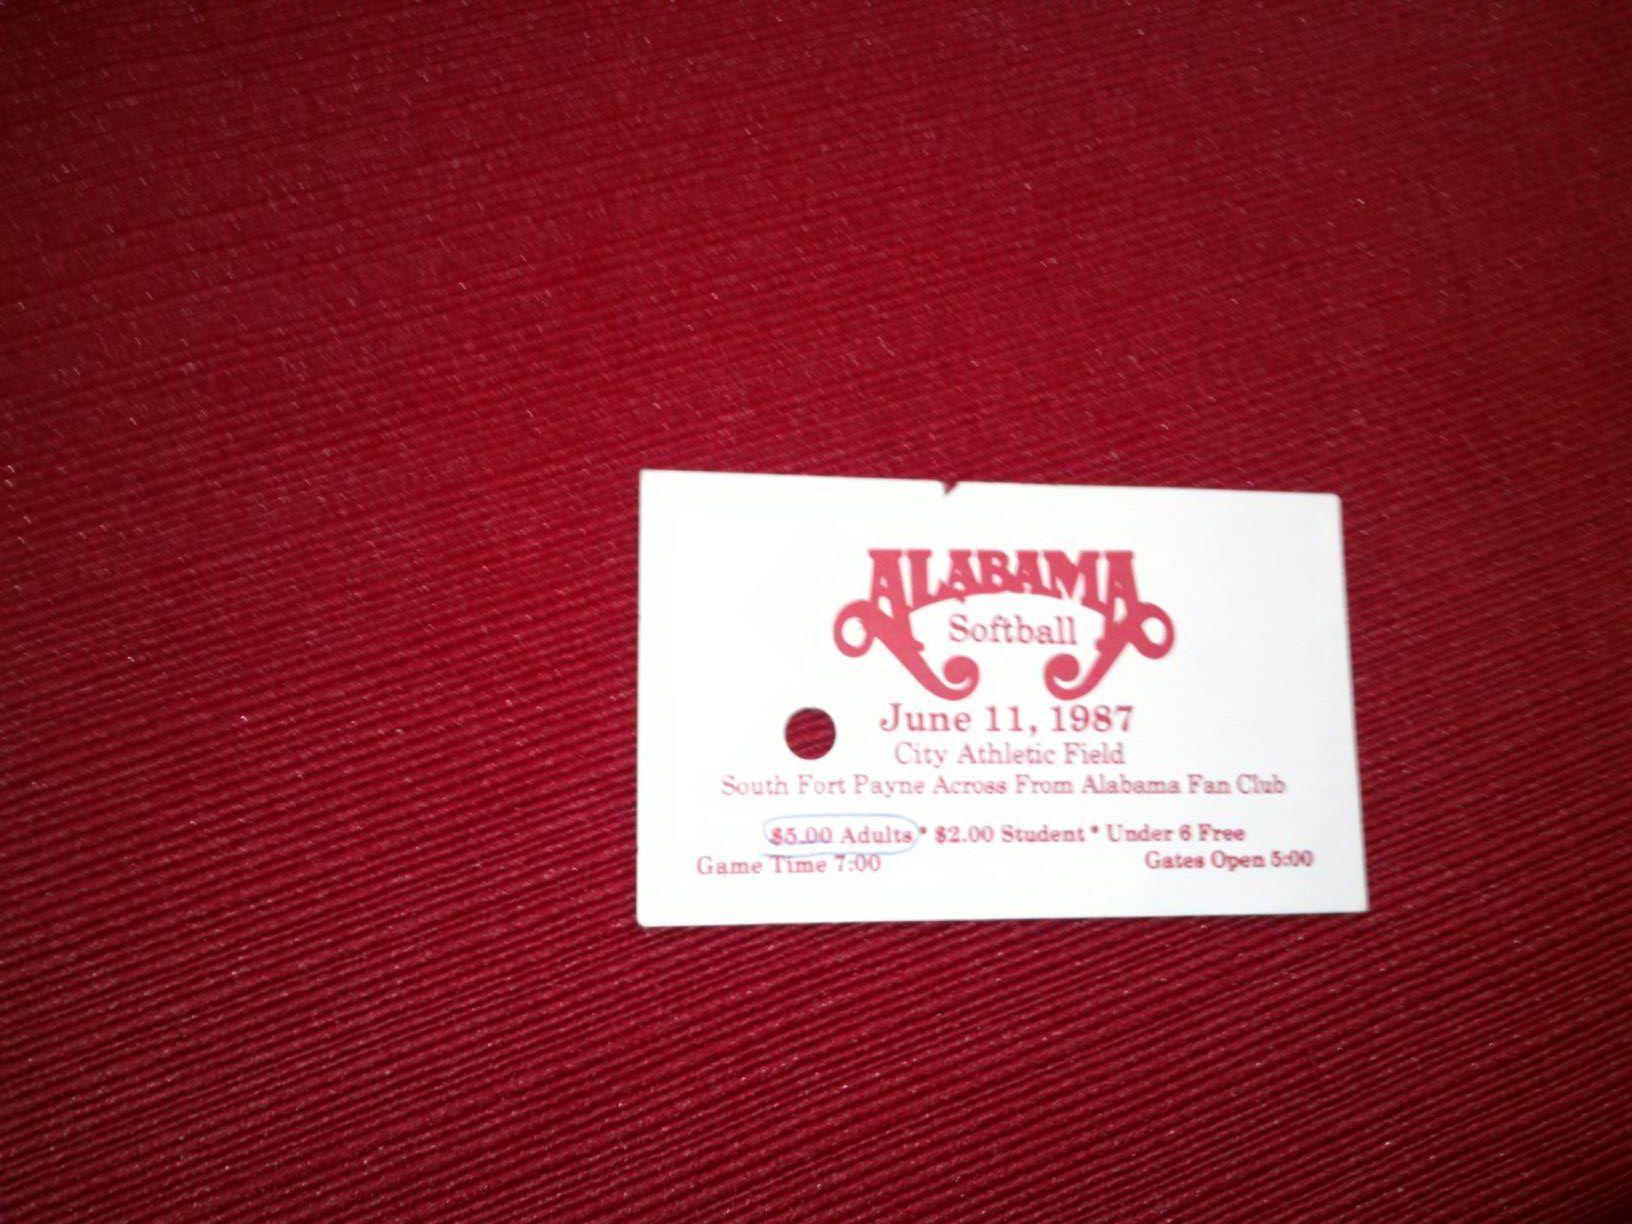 Alabama Softball ticket